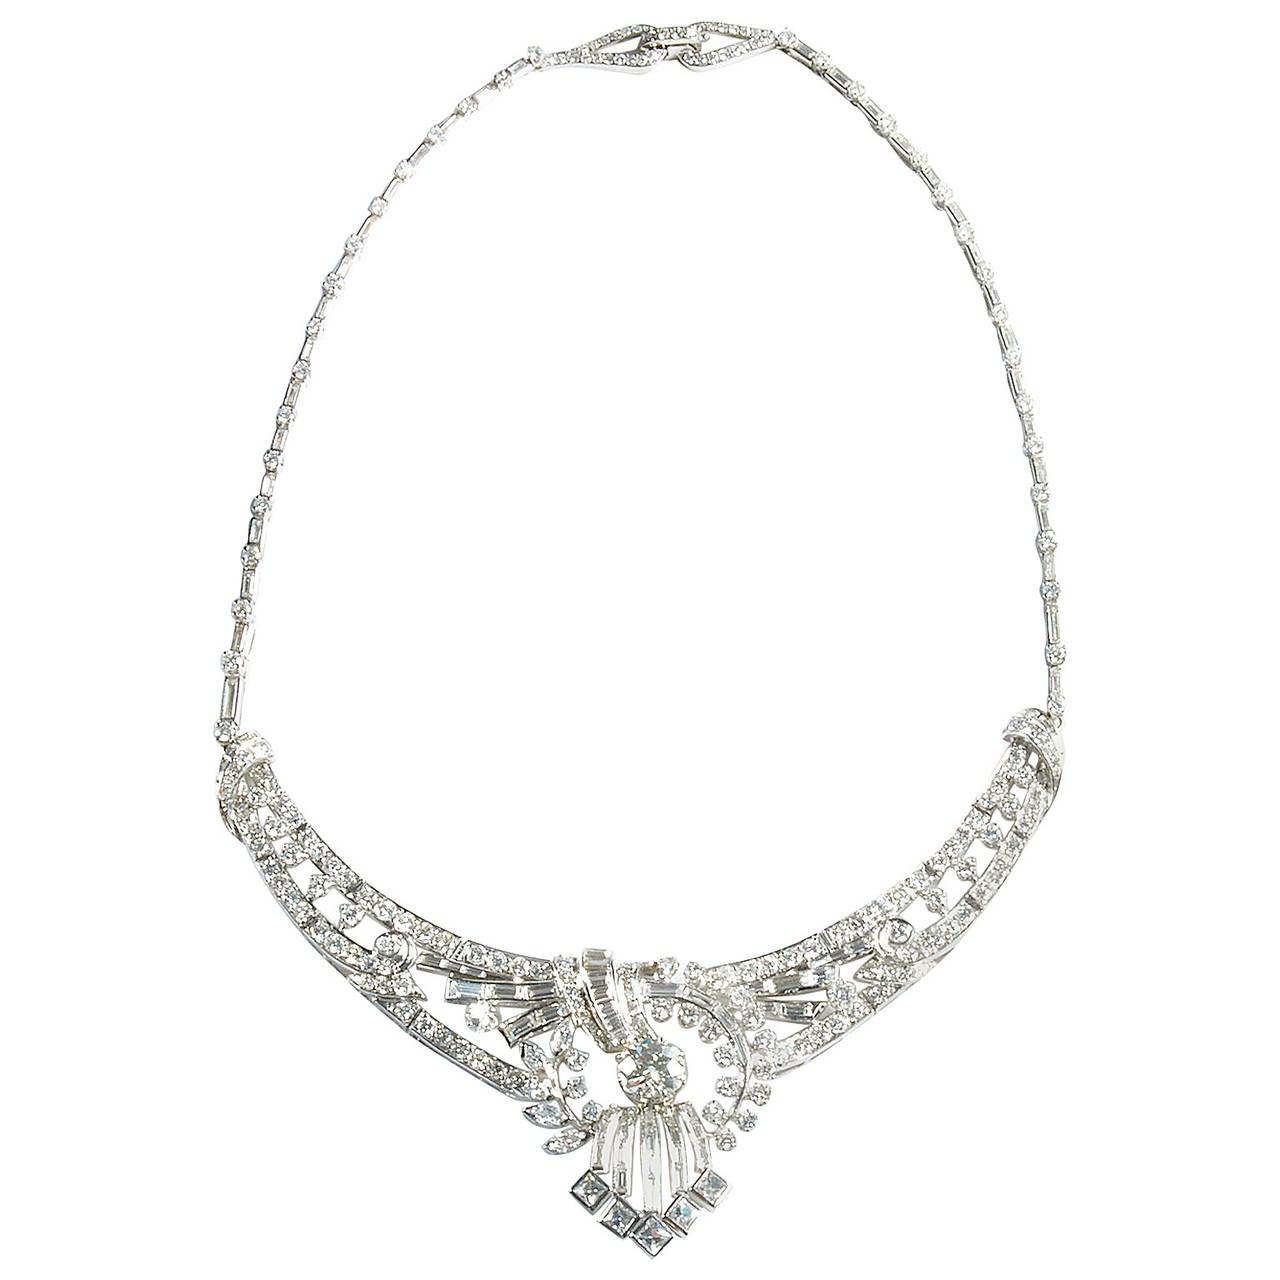 14.73 Carat Art Deco Diamond Platinum Necklace 1